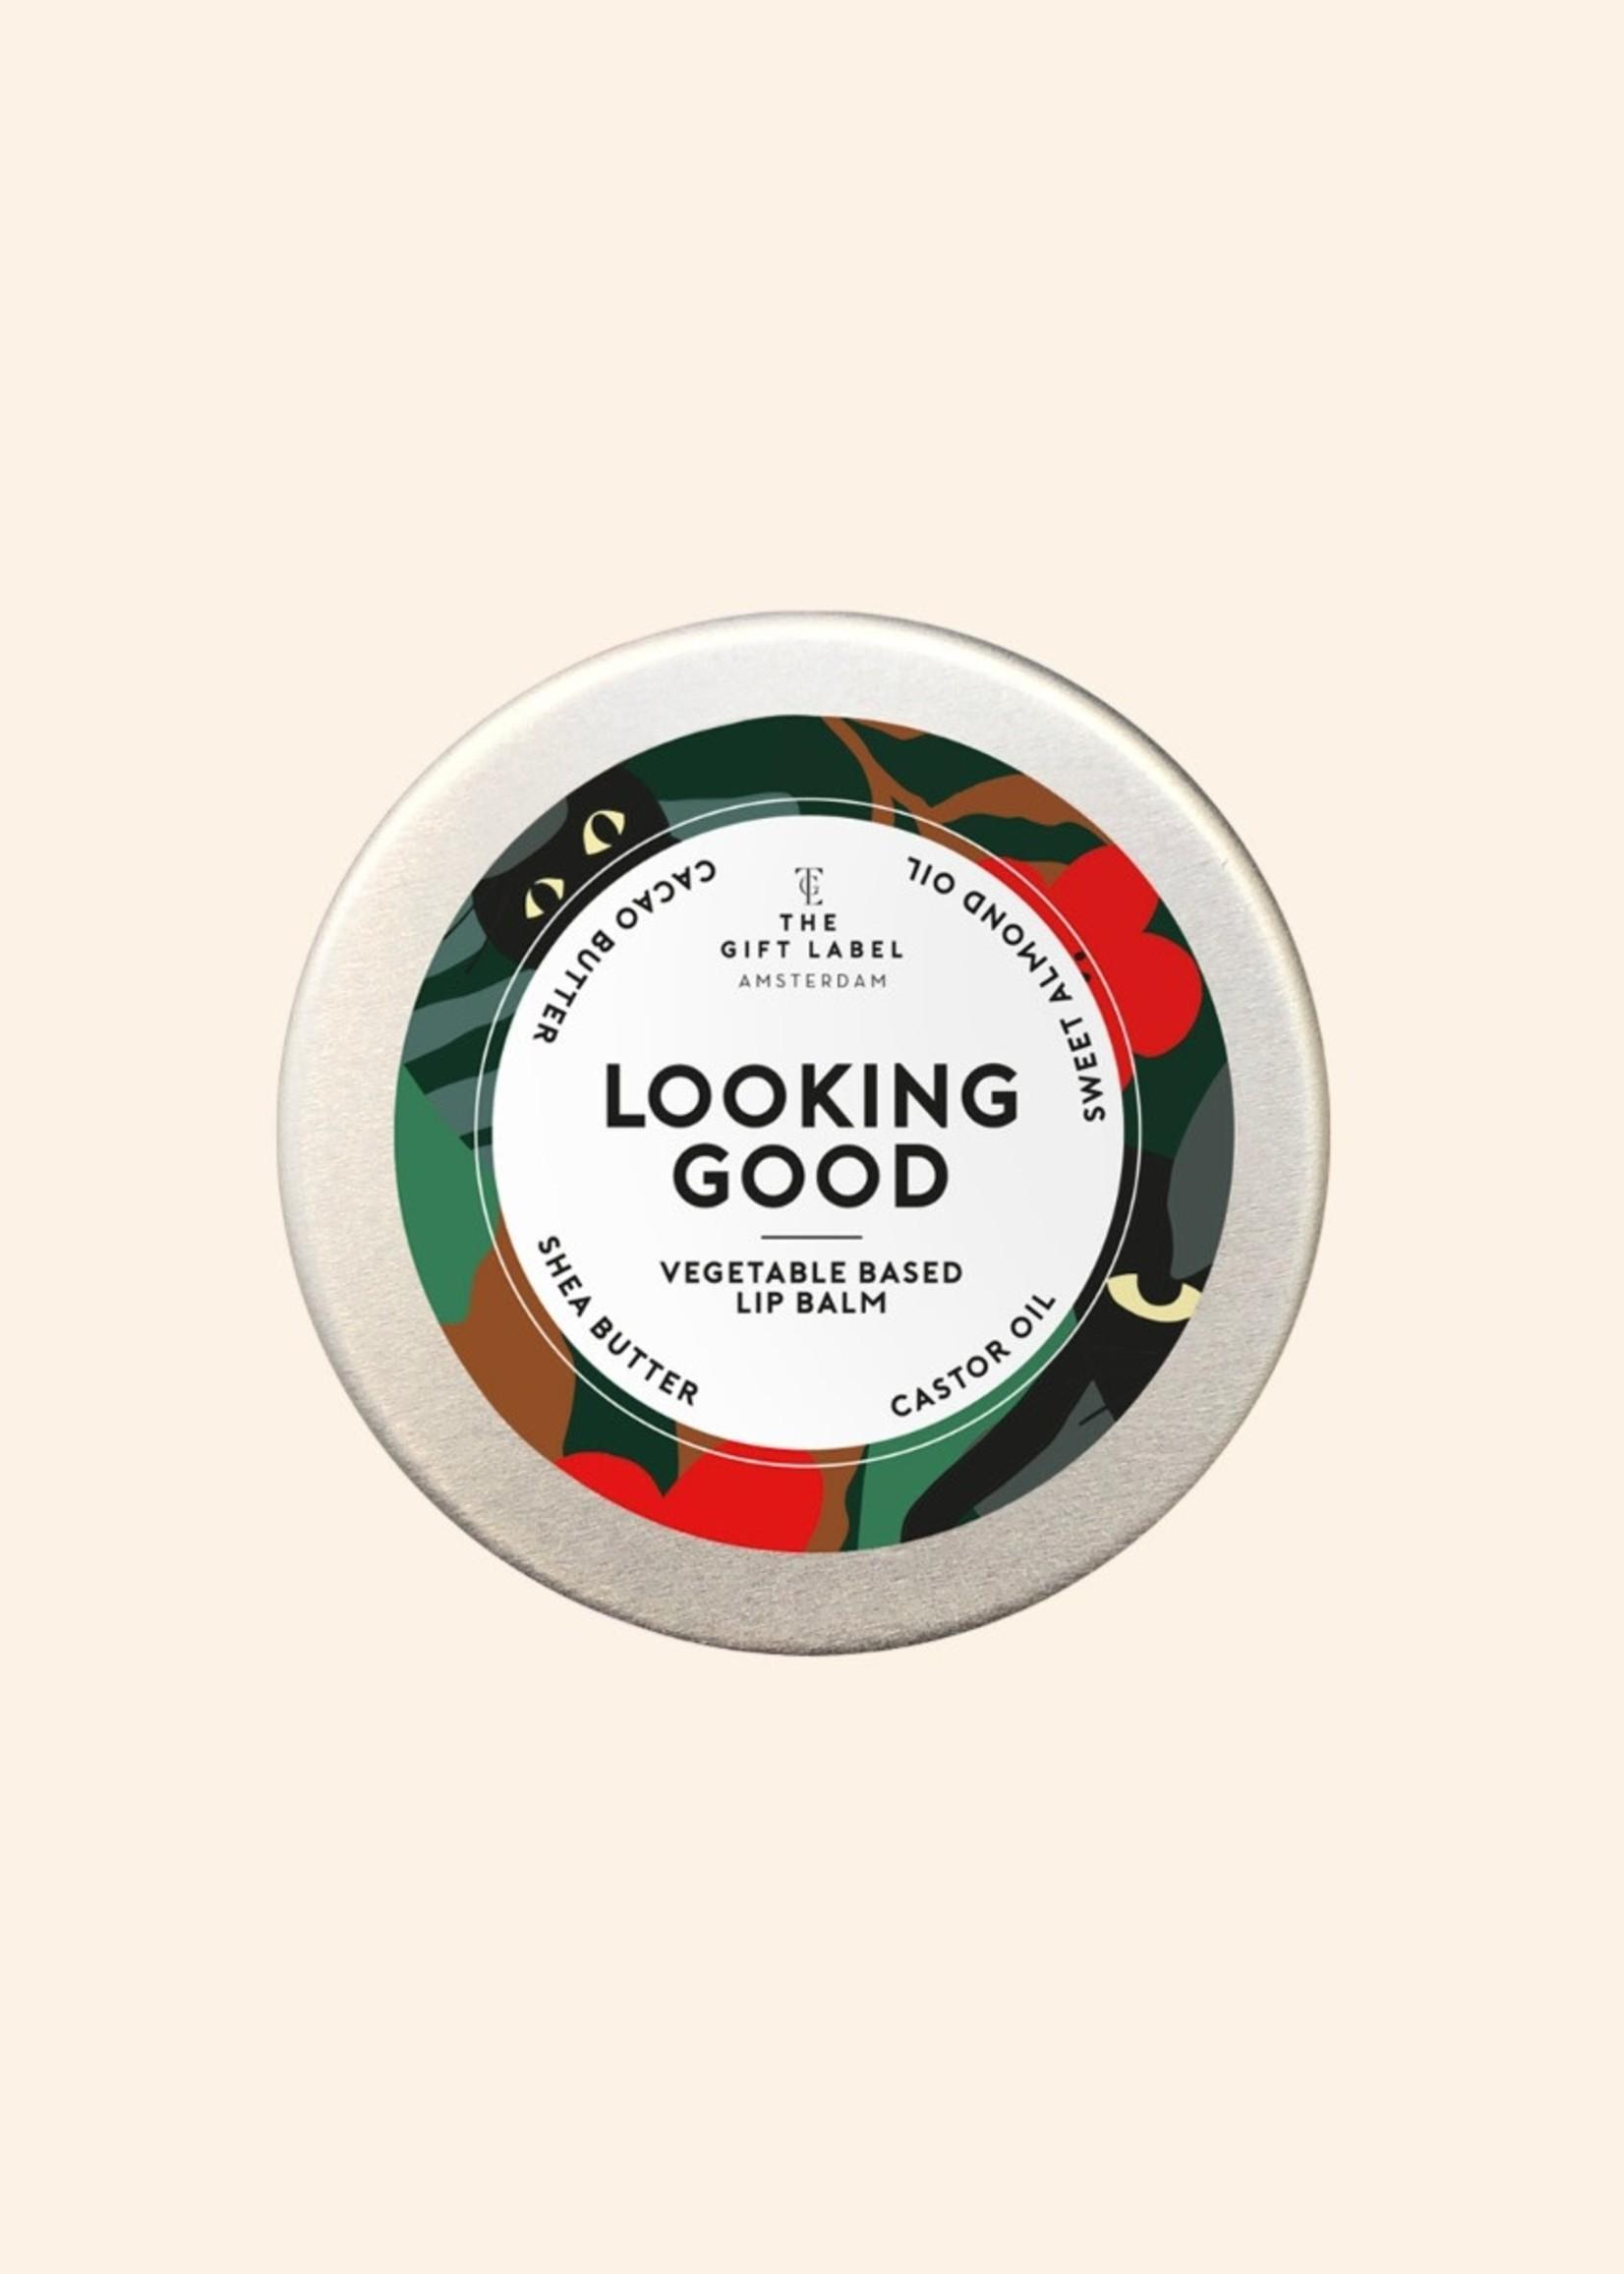 The Gift Label Vegetable Based Lip Balm